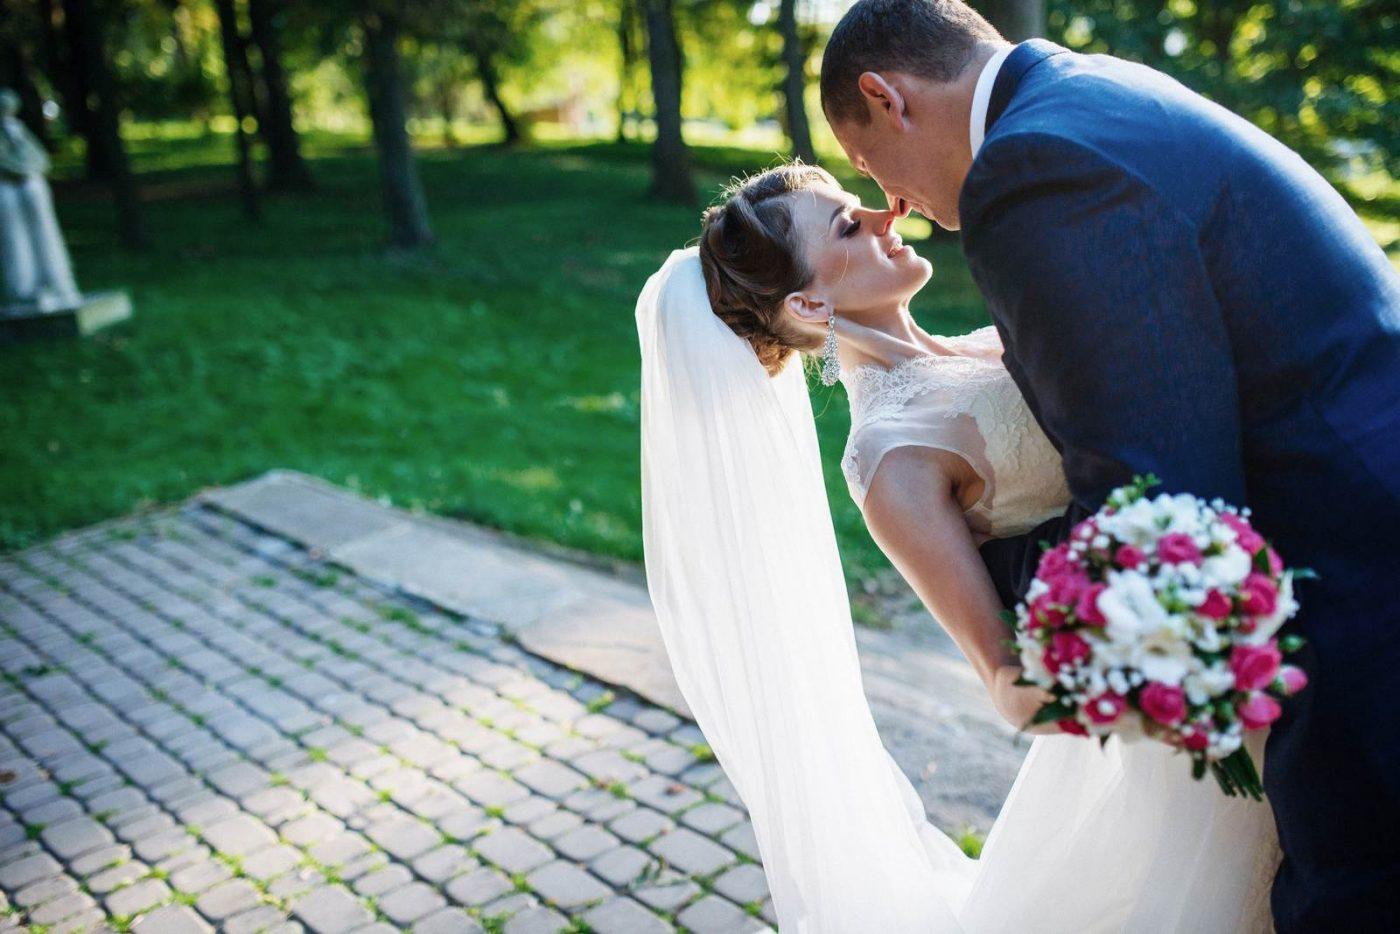 Colorado Springs wedding videographers